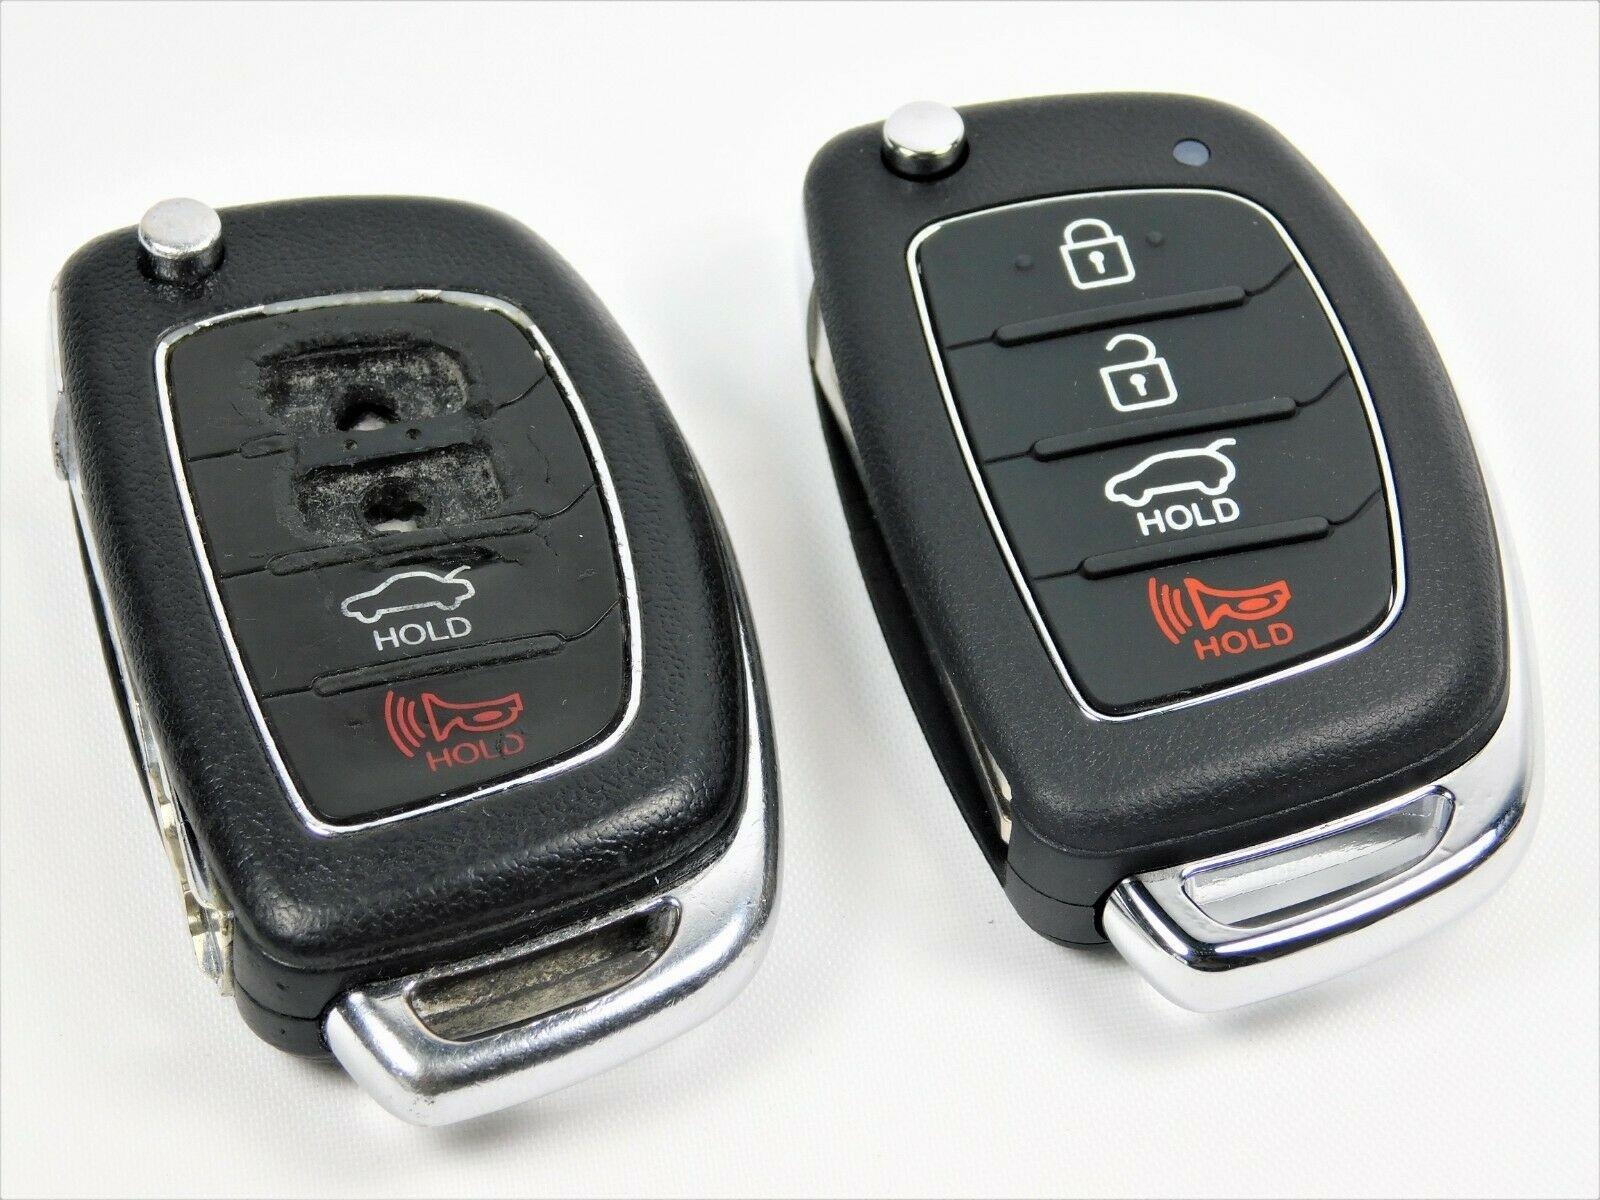 Repair Service for Hyundai IX45 IX25 IX35 I30 I35 4 button remote key